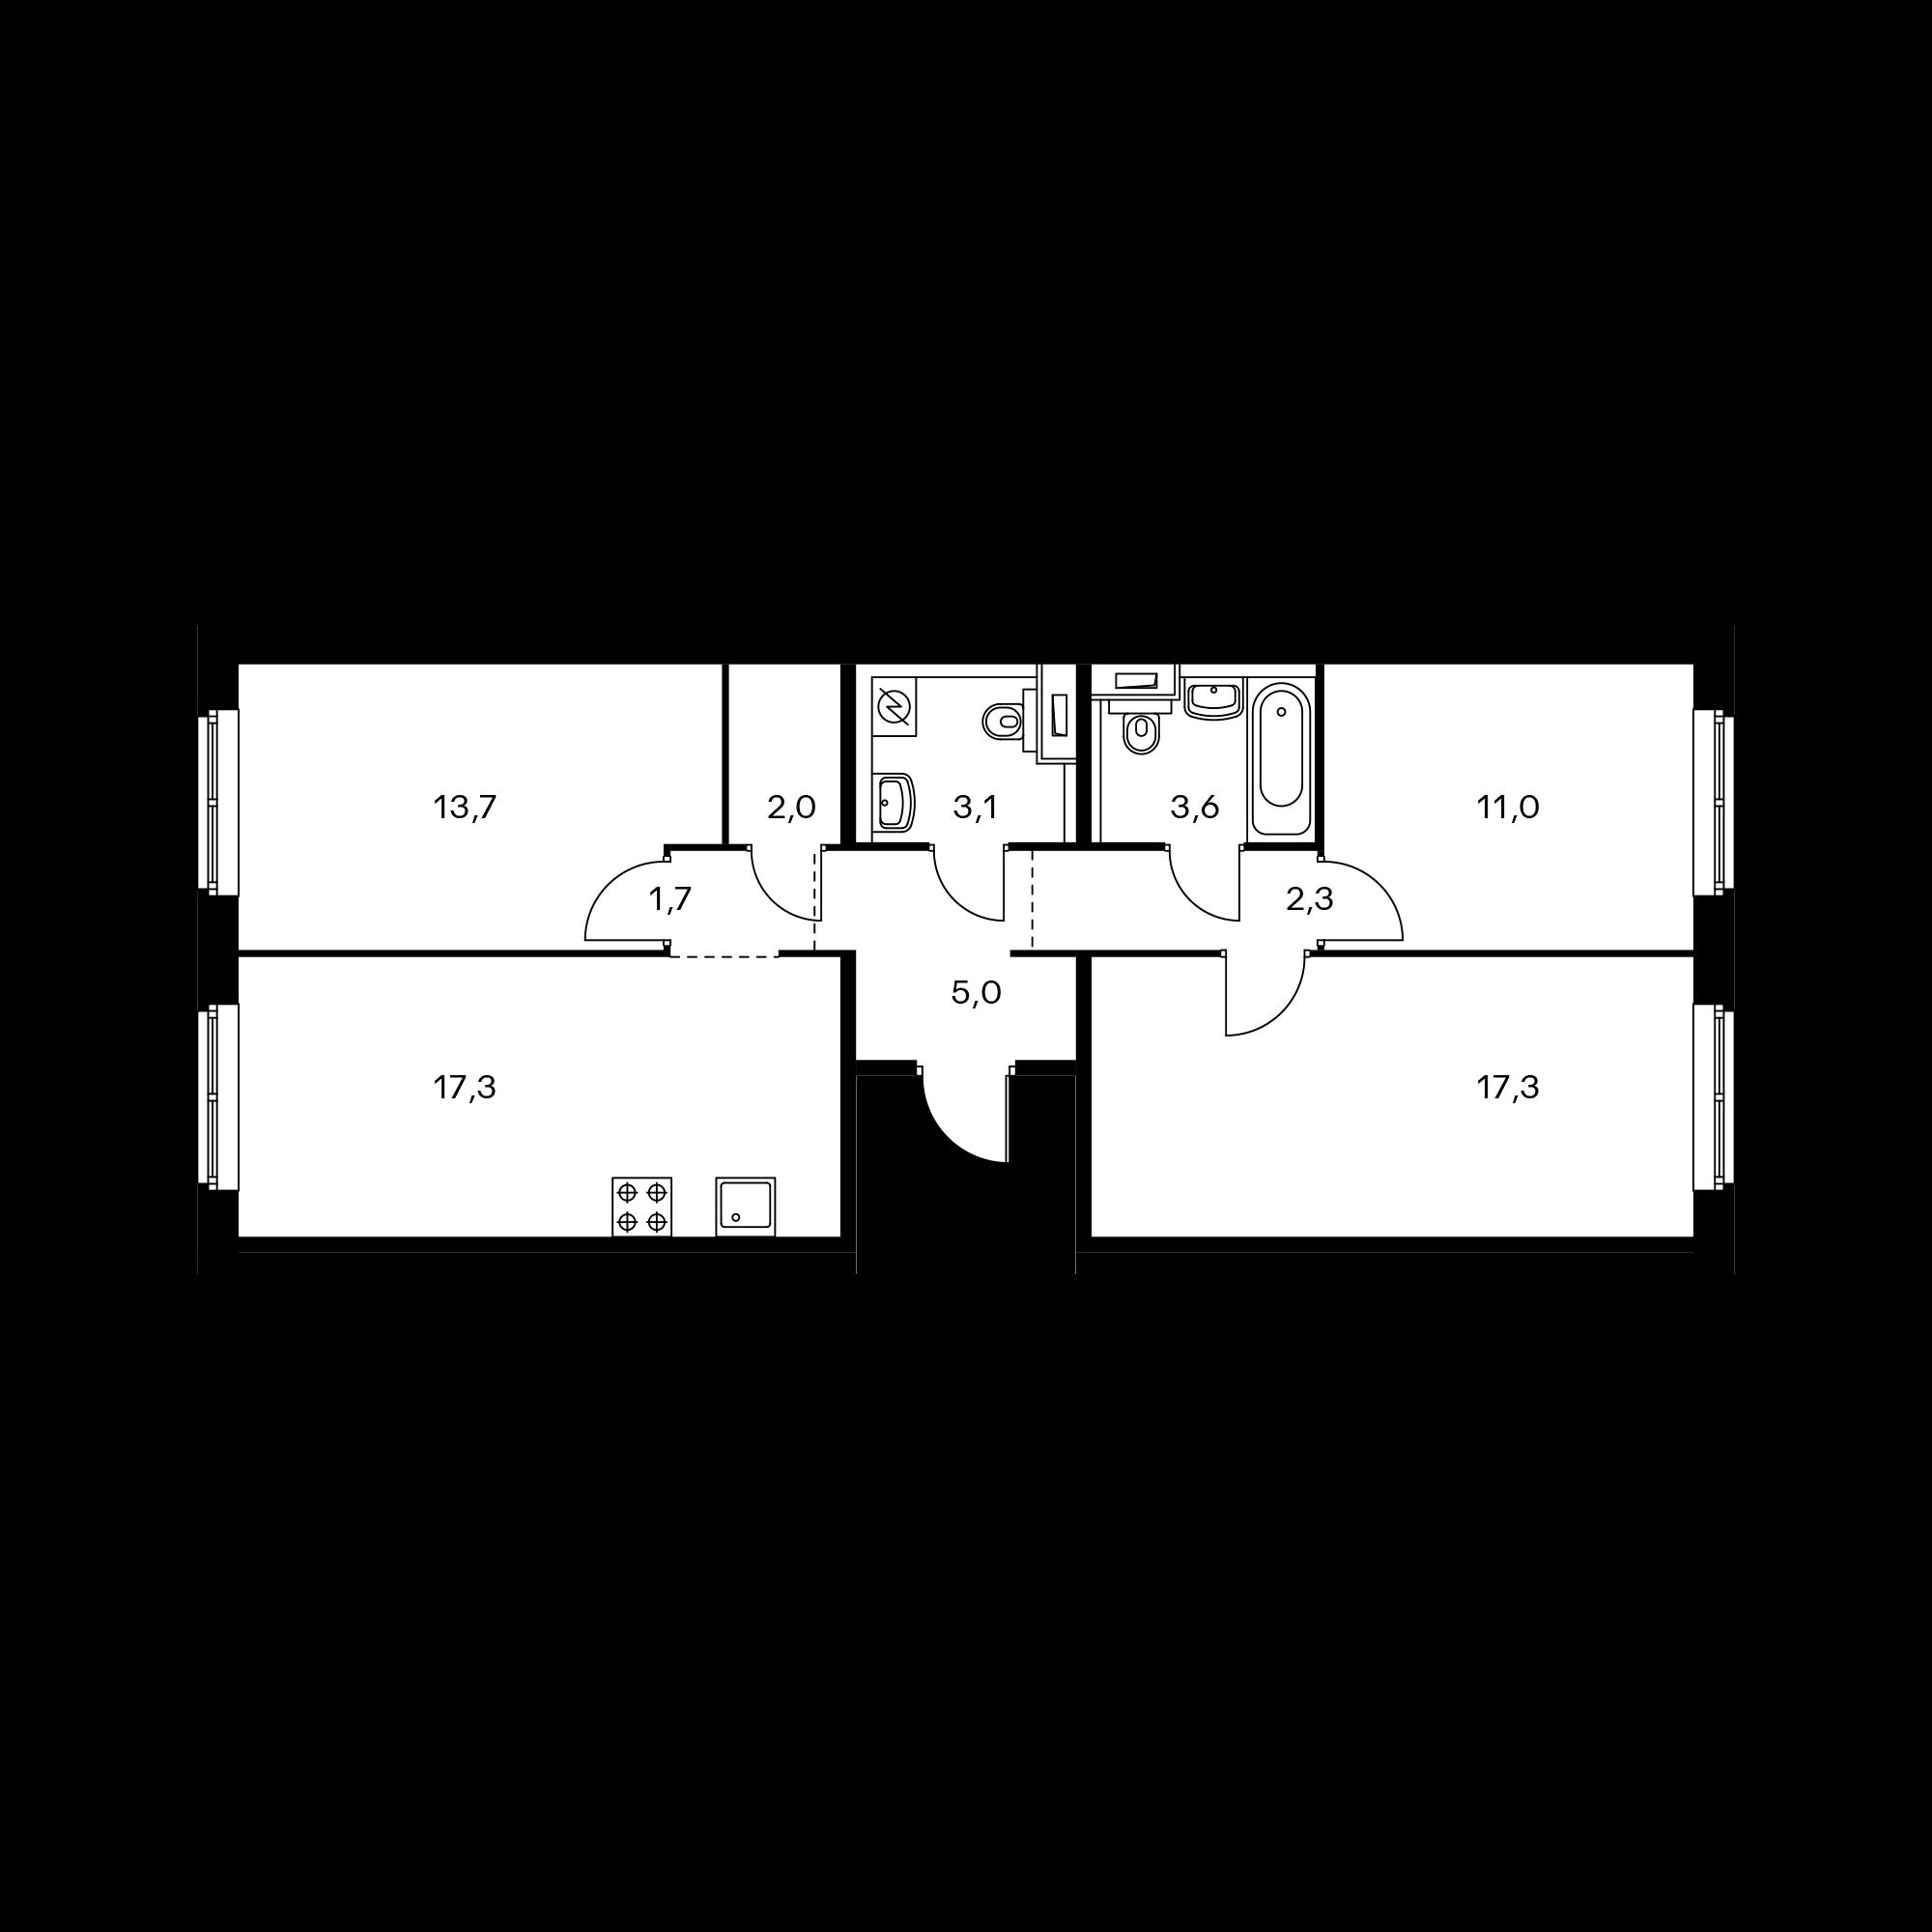 3KM15_6.0-2